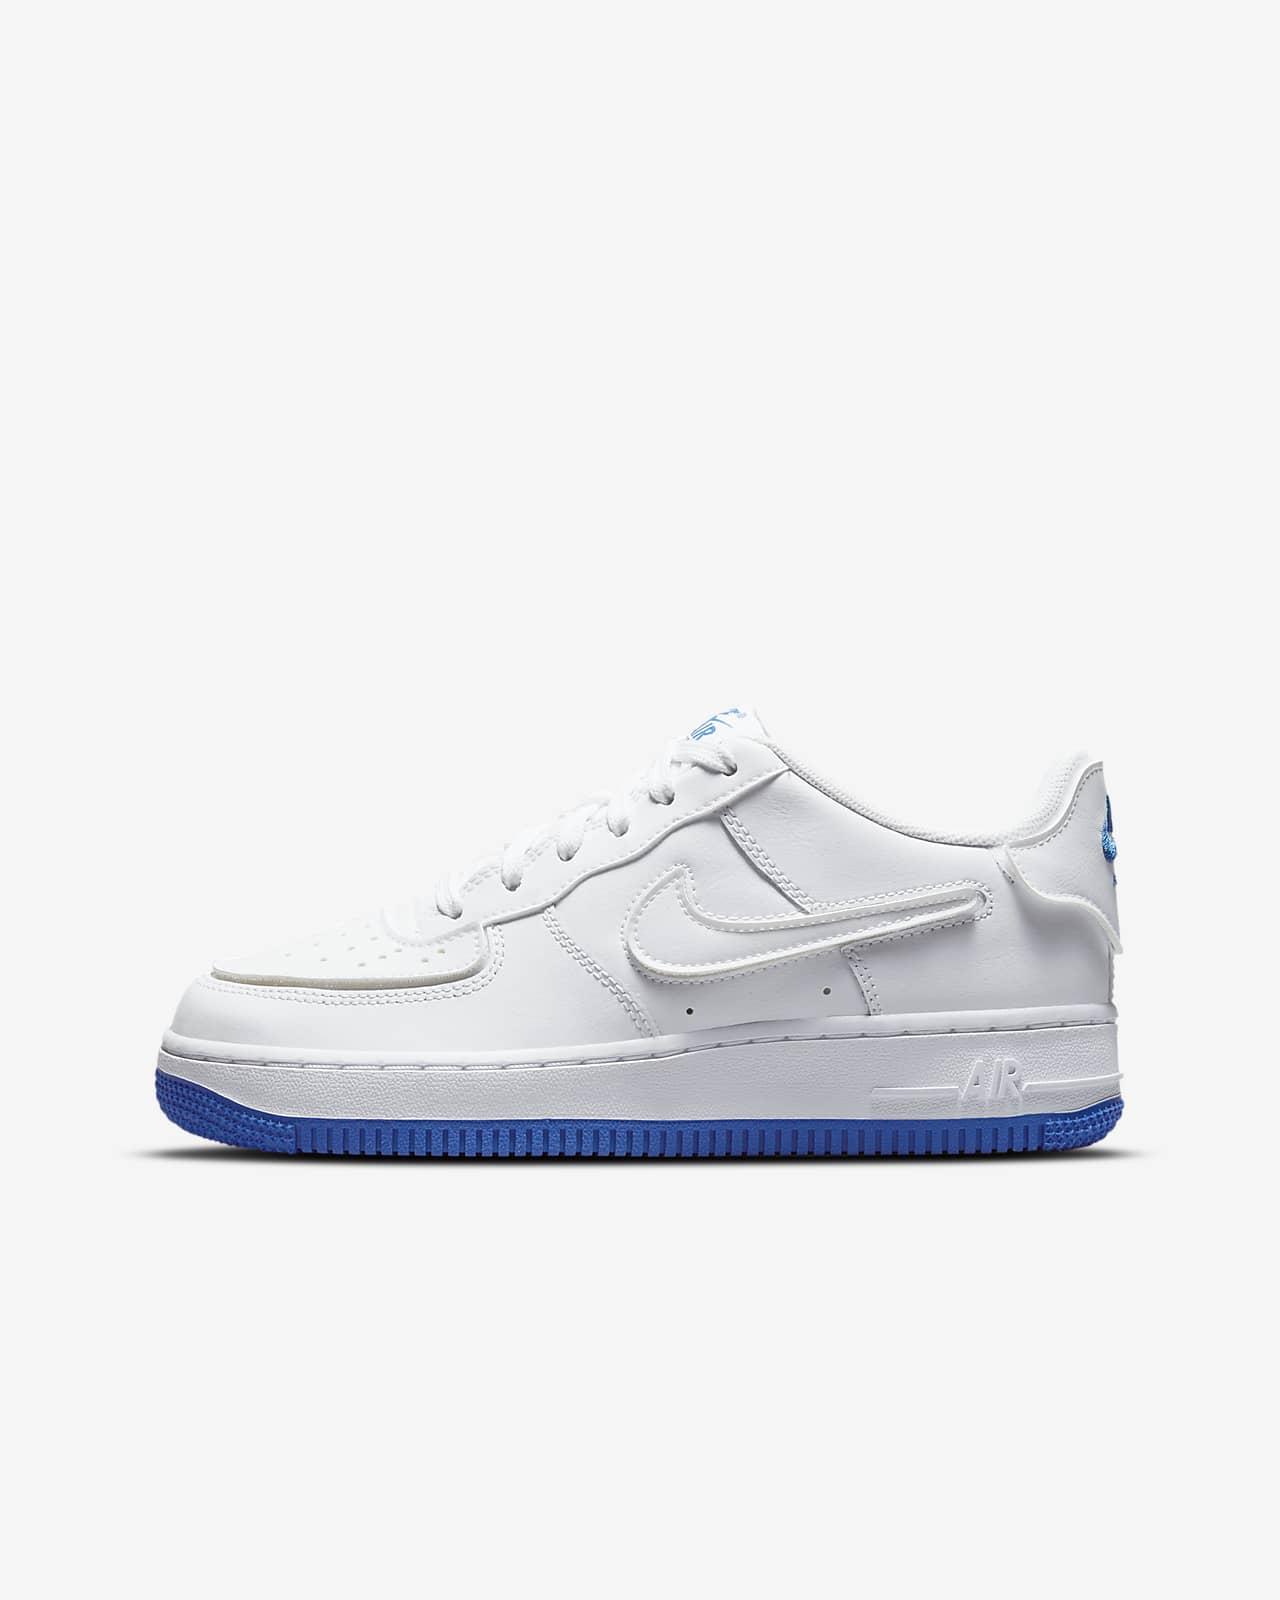 Nike Air Force 1/1 Schuh für ältere Kinder